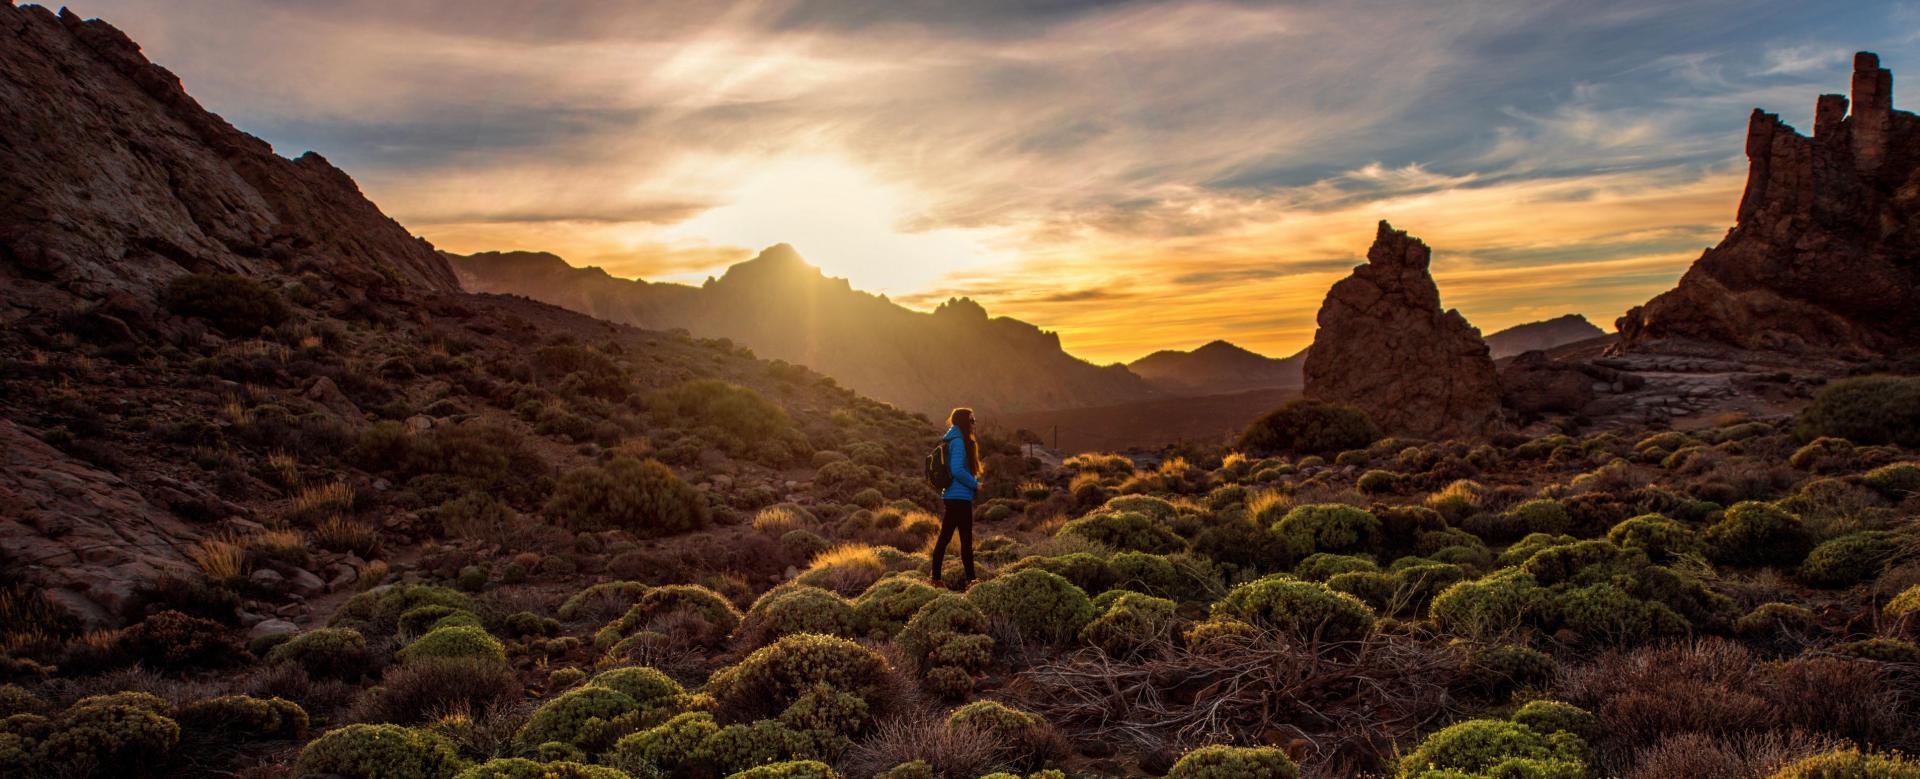 Image Tenerife idyllique